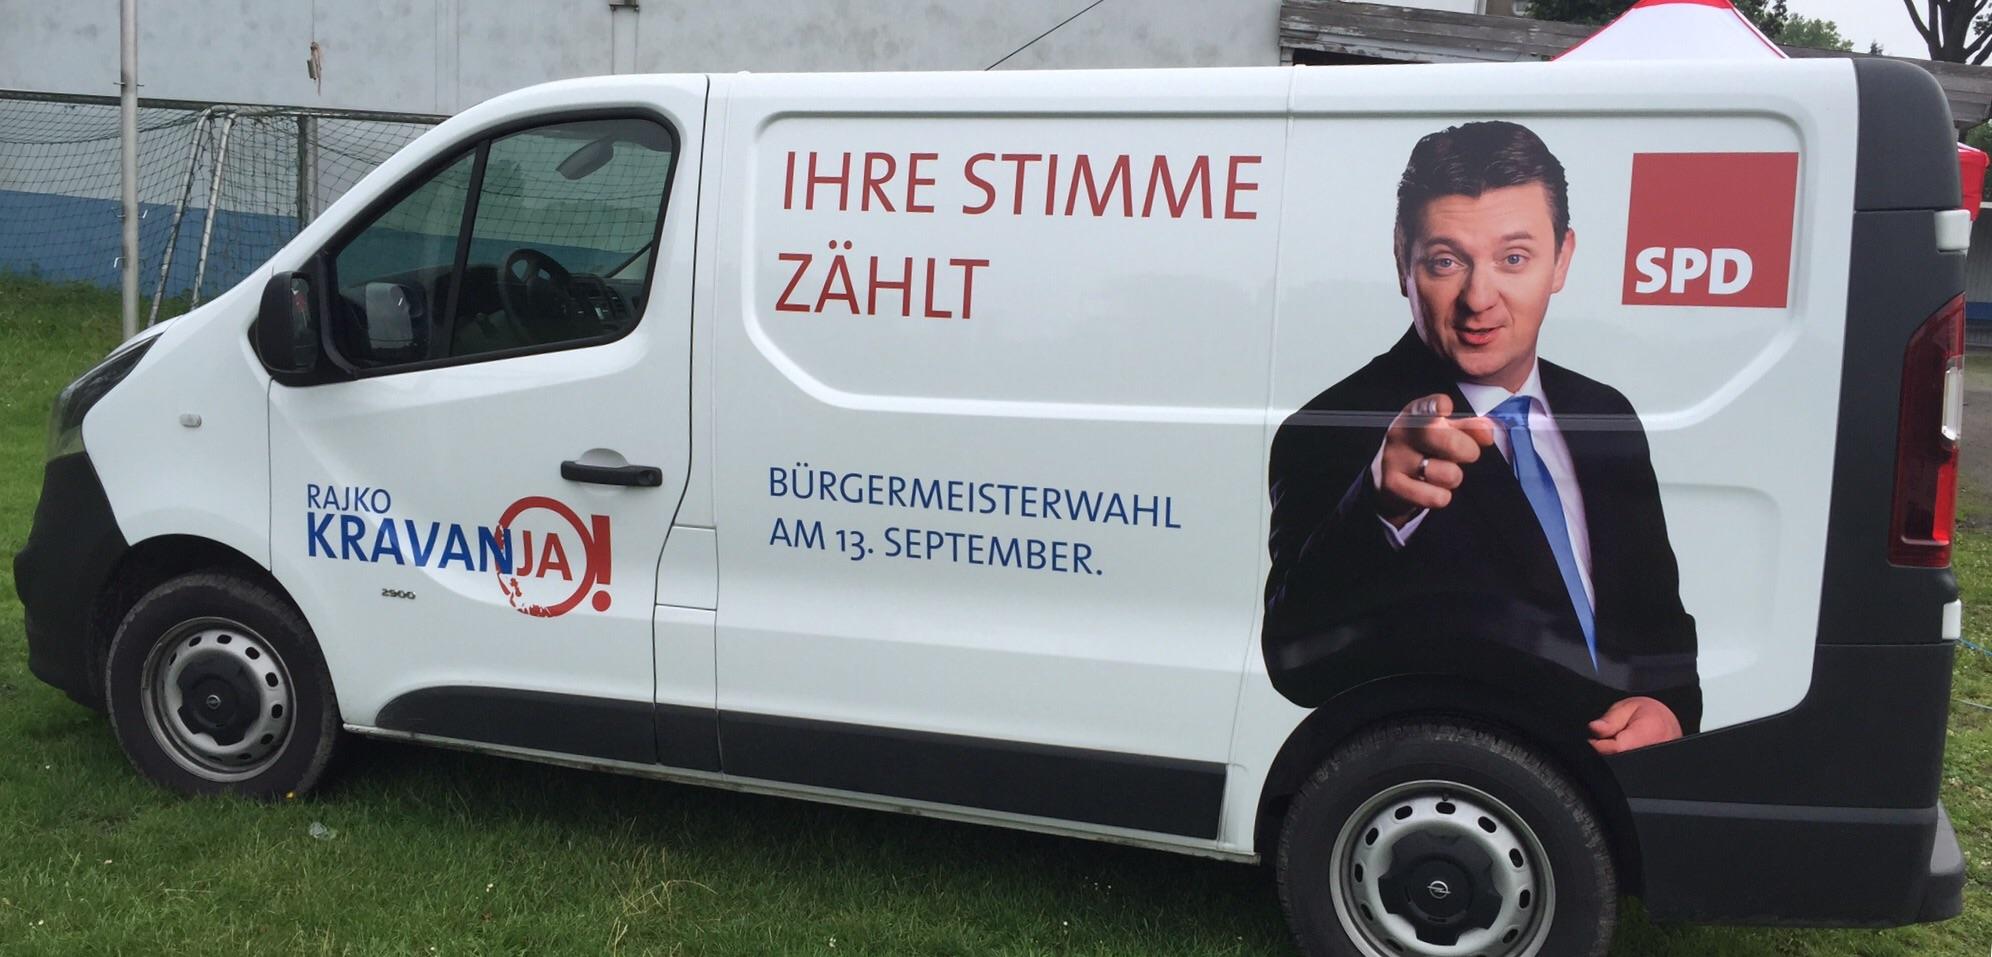 SPD bietet kostenloses Wahltaxi an